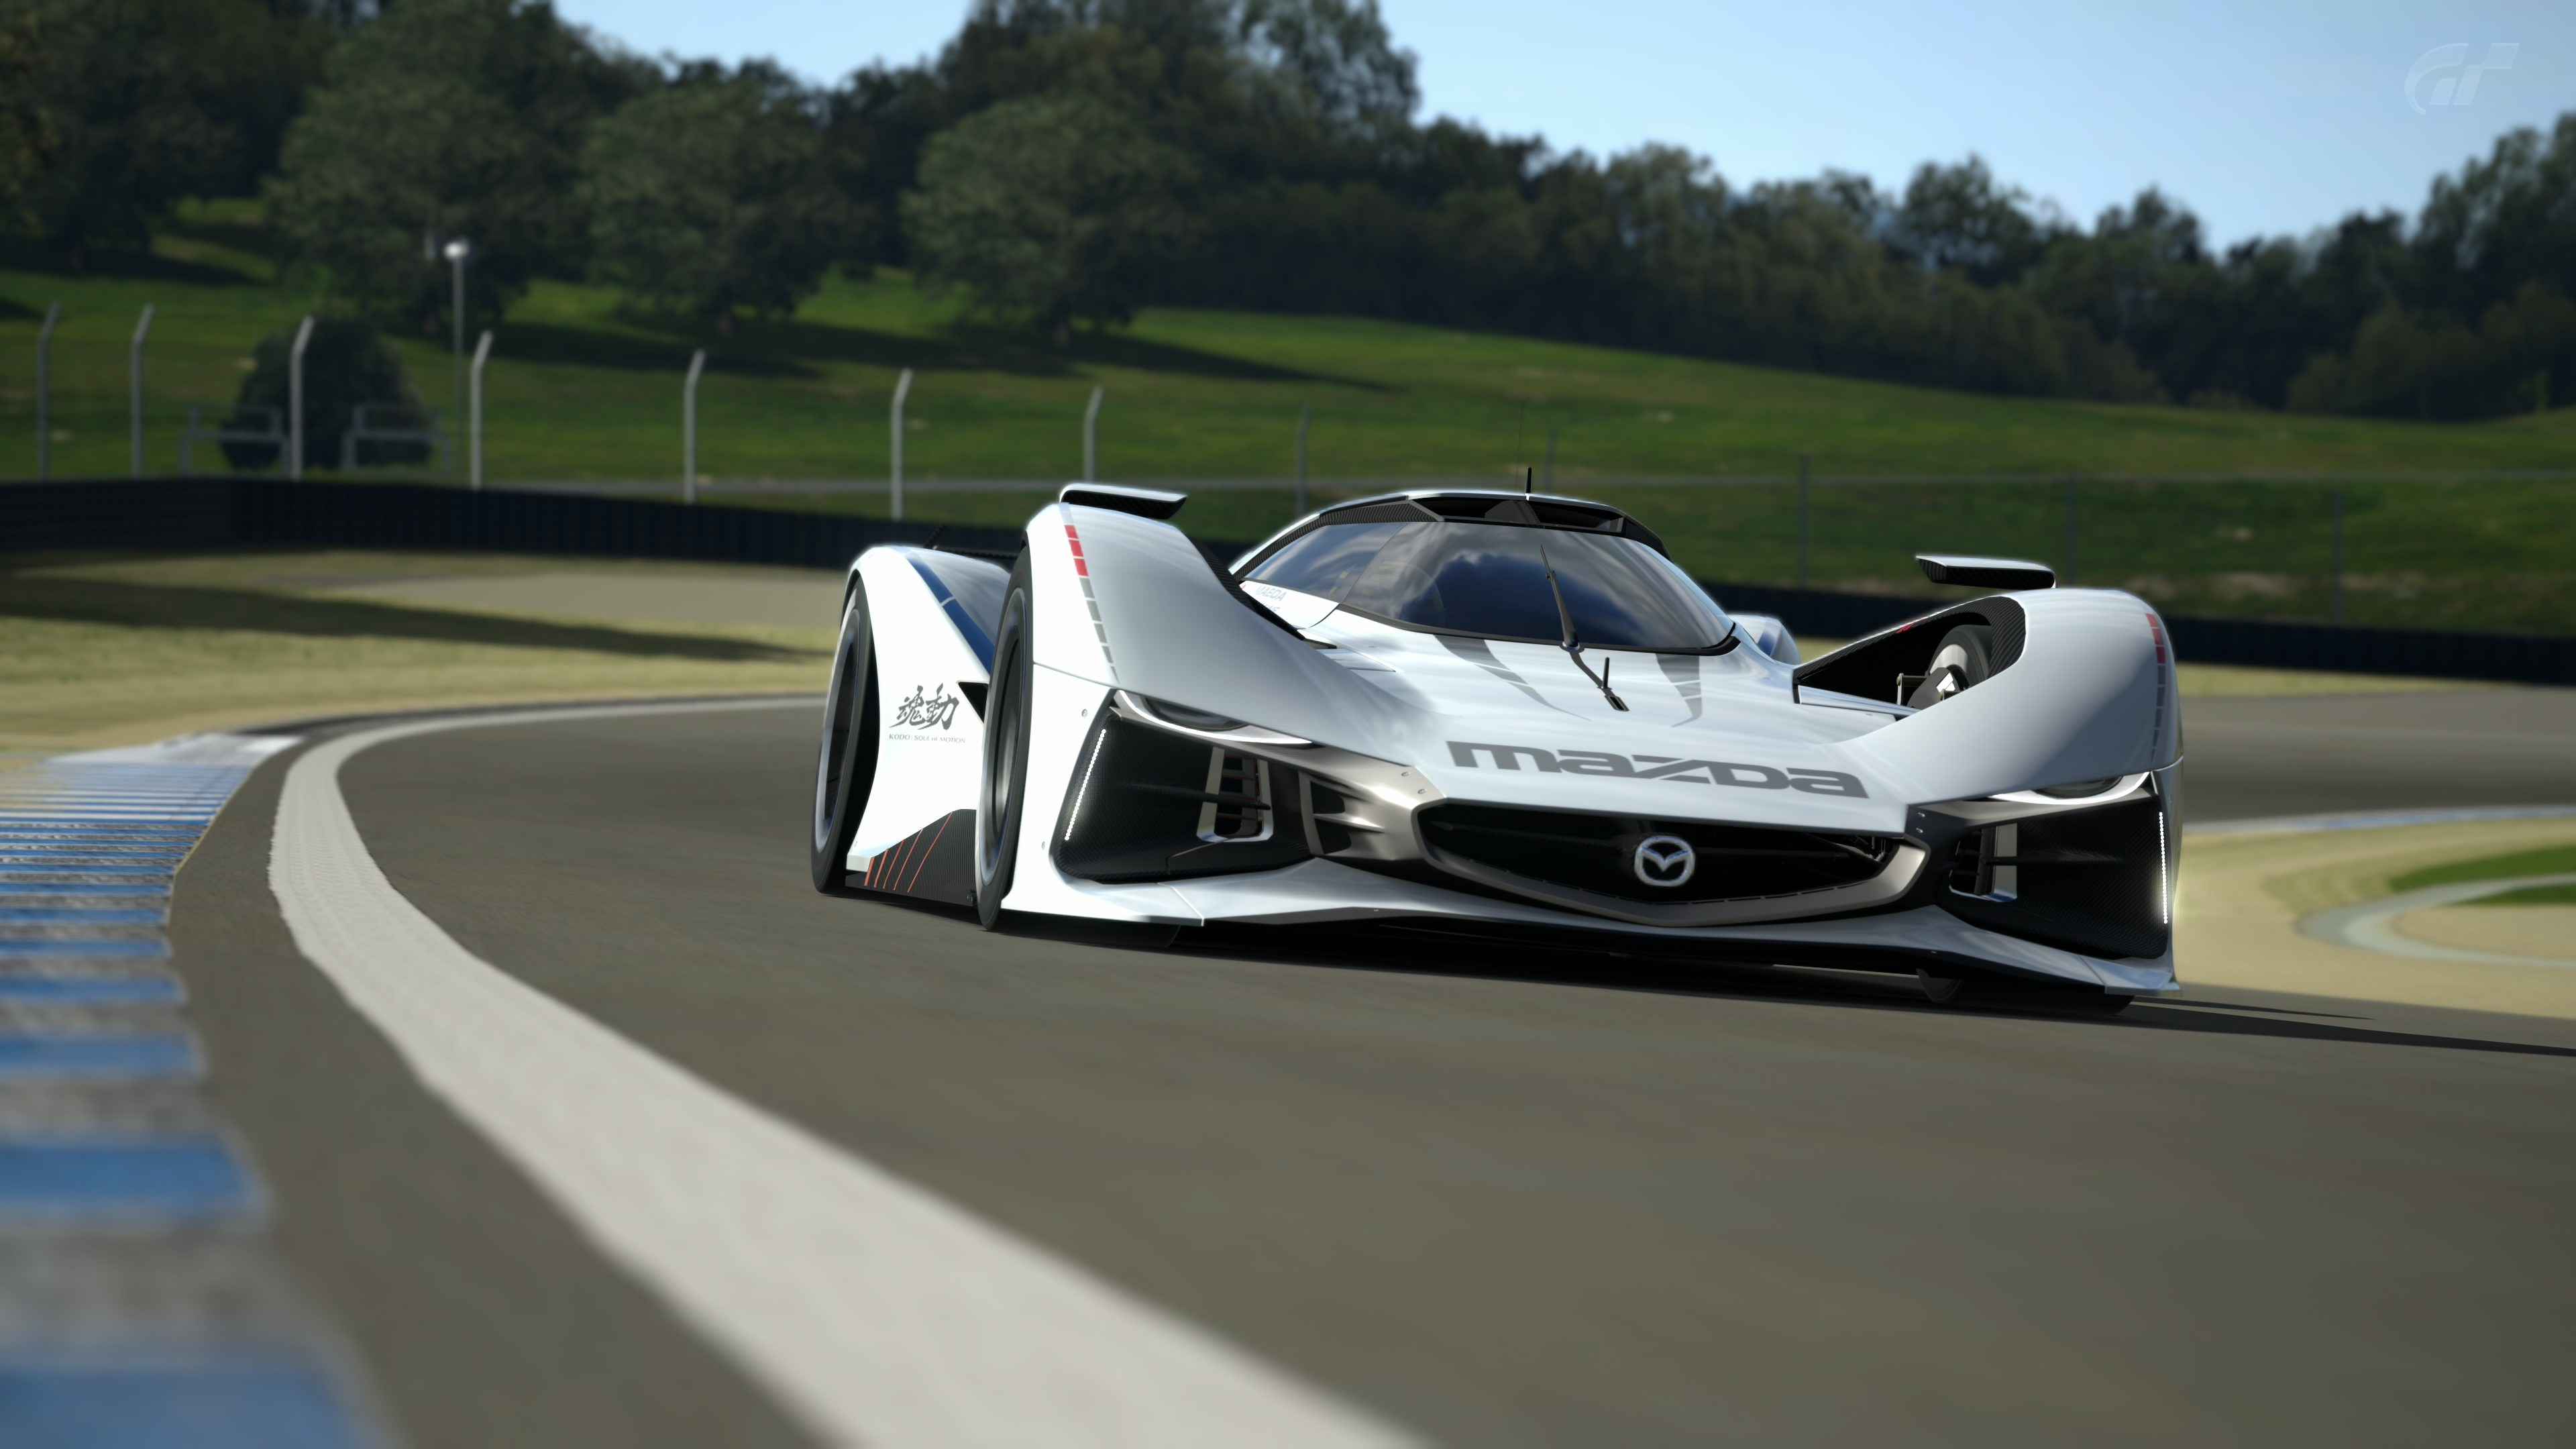 Mazda Raceway Laguna Seca _2.jpg